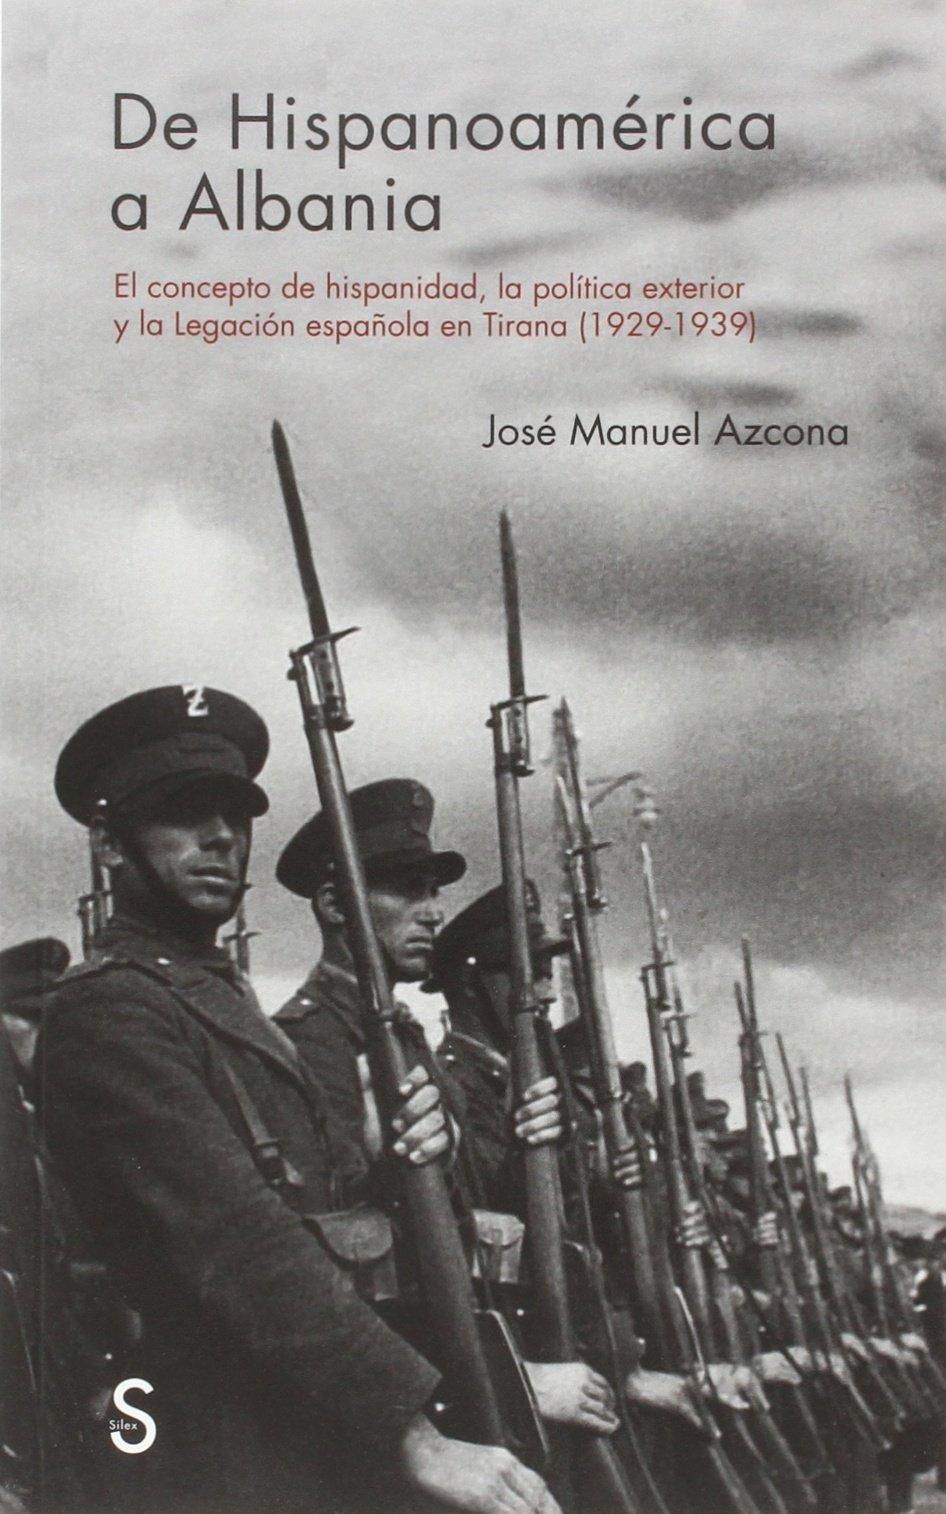 DE HISPANOAMERICA A ALBANIA Serie Historia Contemporanea: Amazon.es: Azcona Pastor, José Manuel: Libros